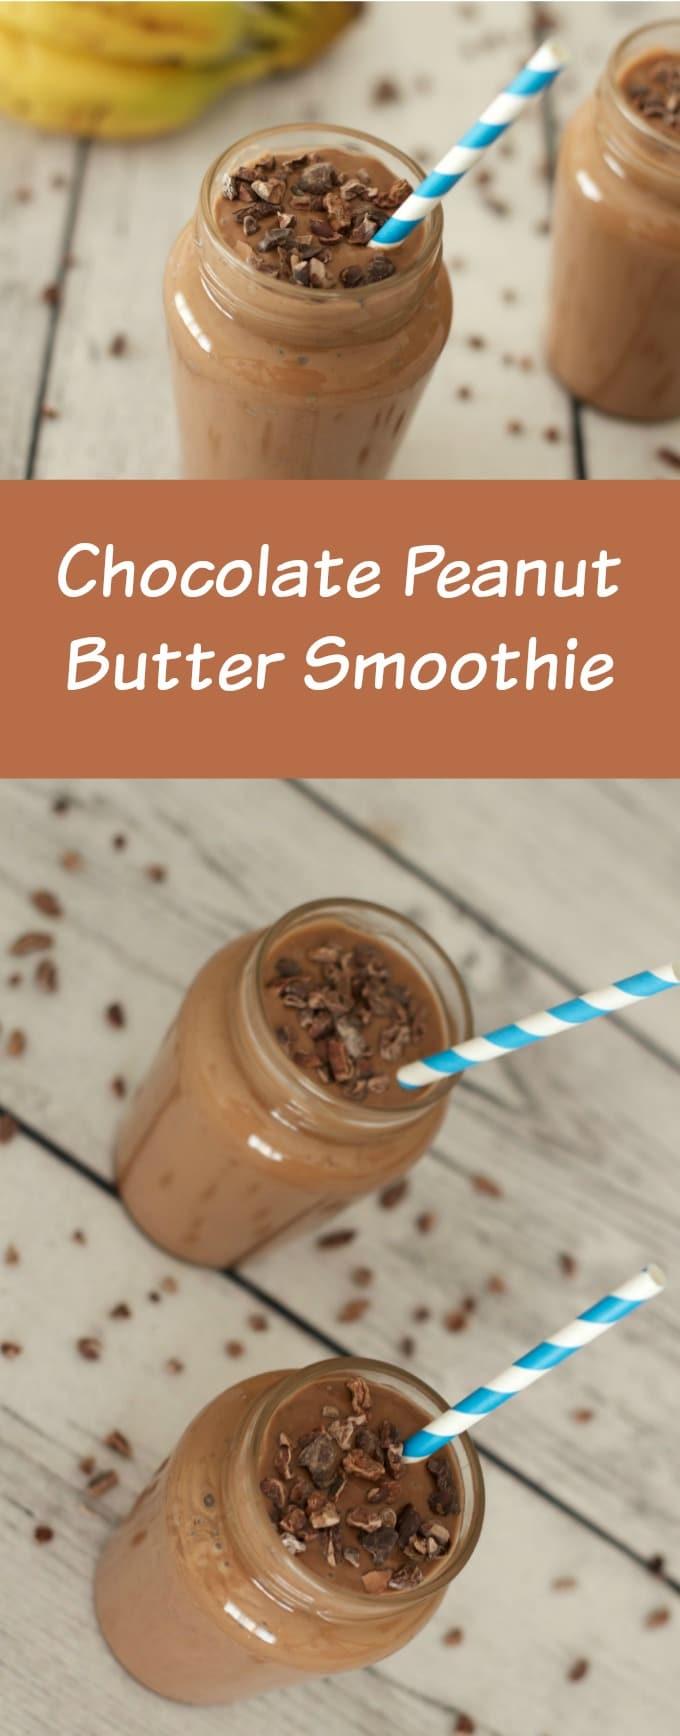 Chocolate Peanut Butter Smoothie - ideal as an anytime snack or a breakfast power shake! #vegan #smoothie #dairy-free #gluten-free #lovingitvegan